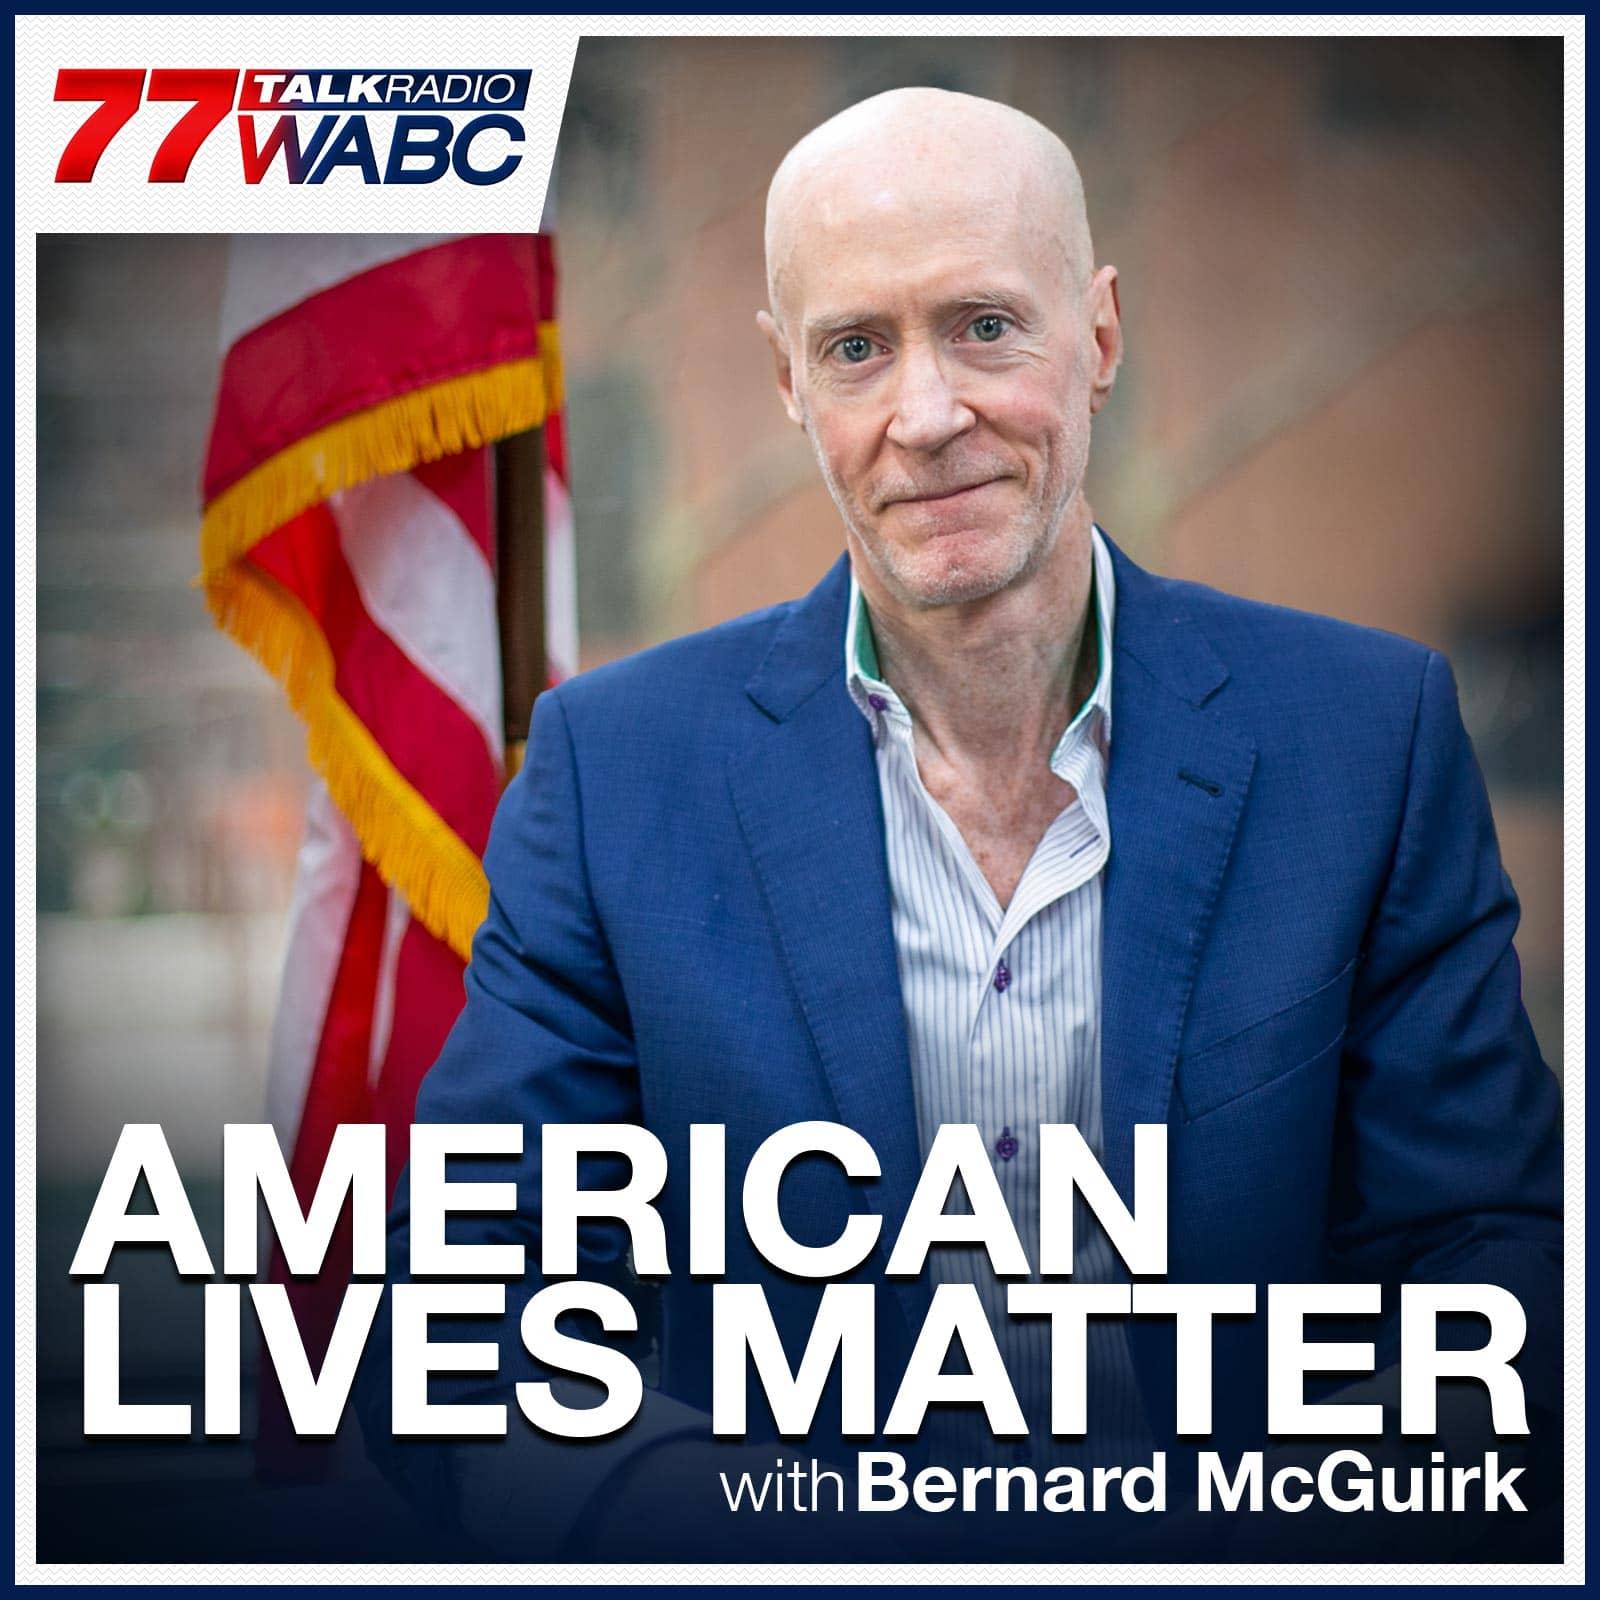 American Lives Matter